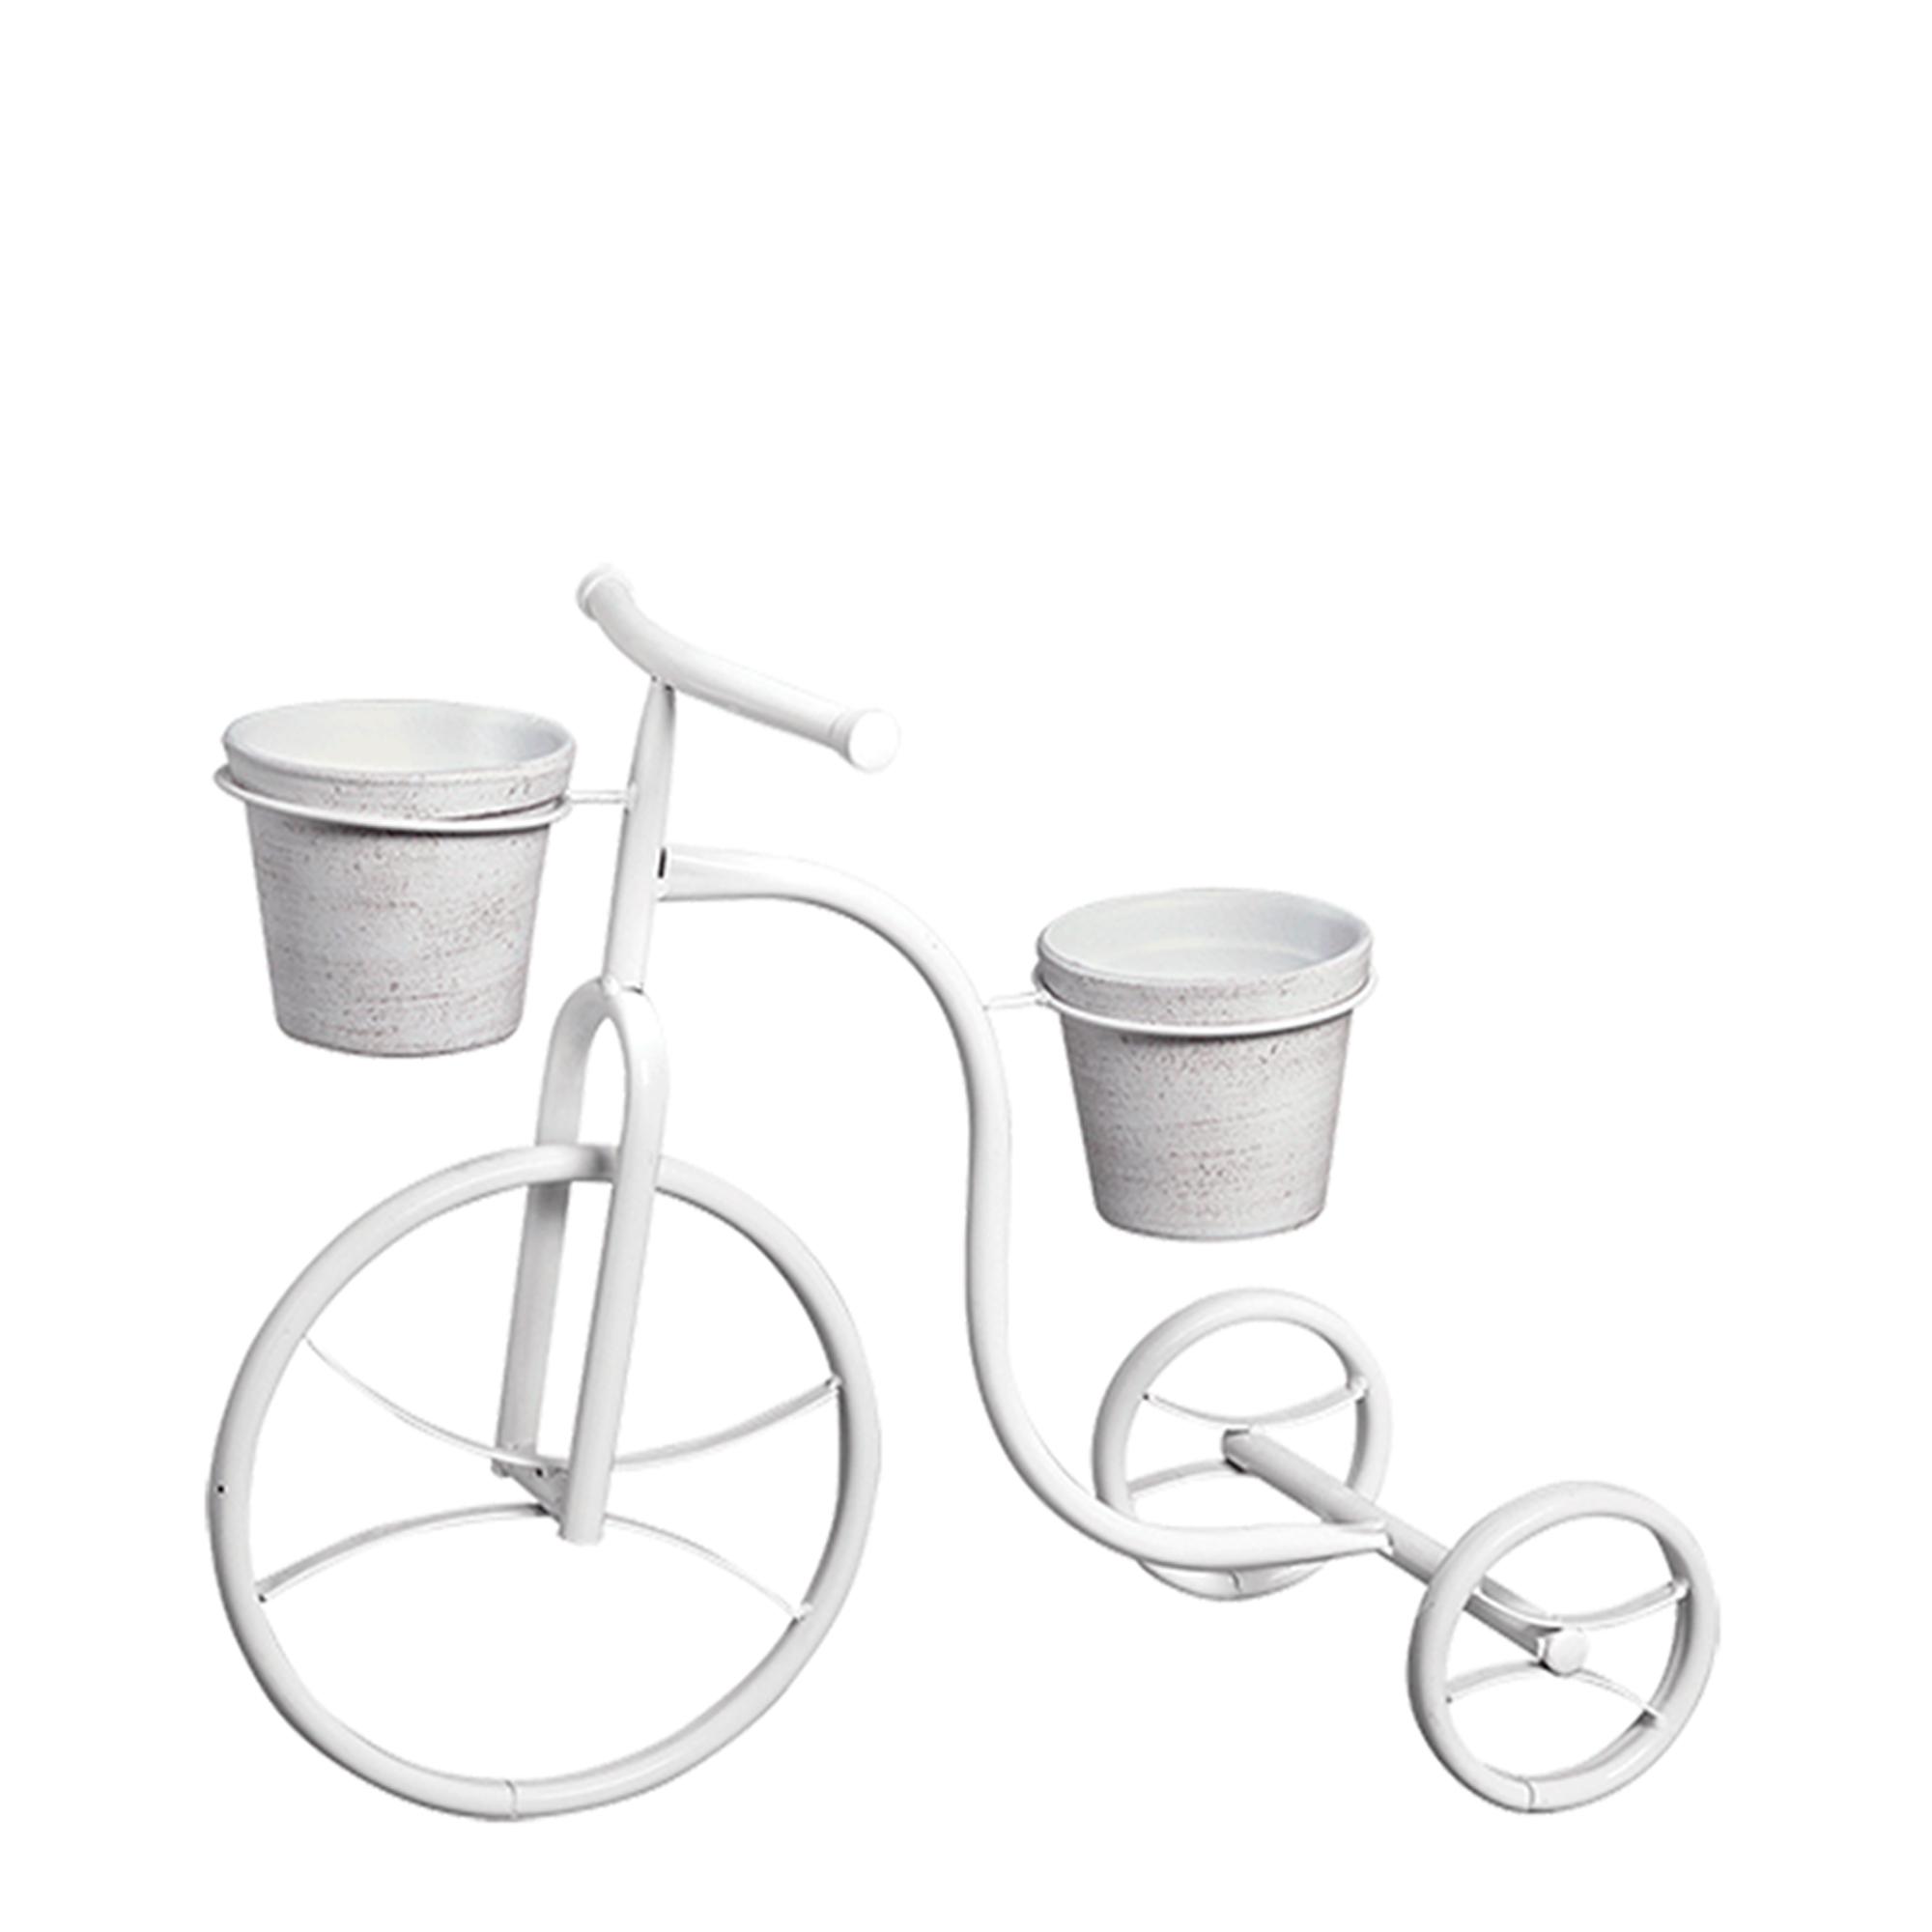 Bicicleta Torta c/ 2 Vasos Barro